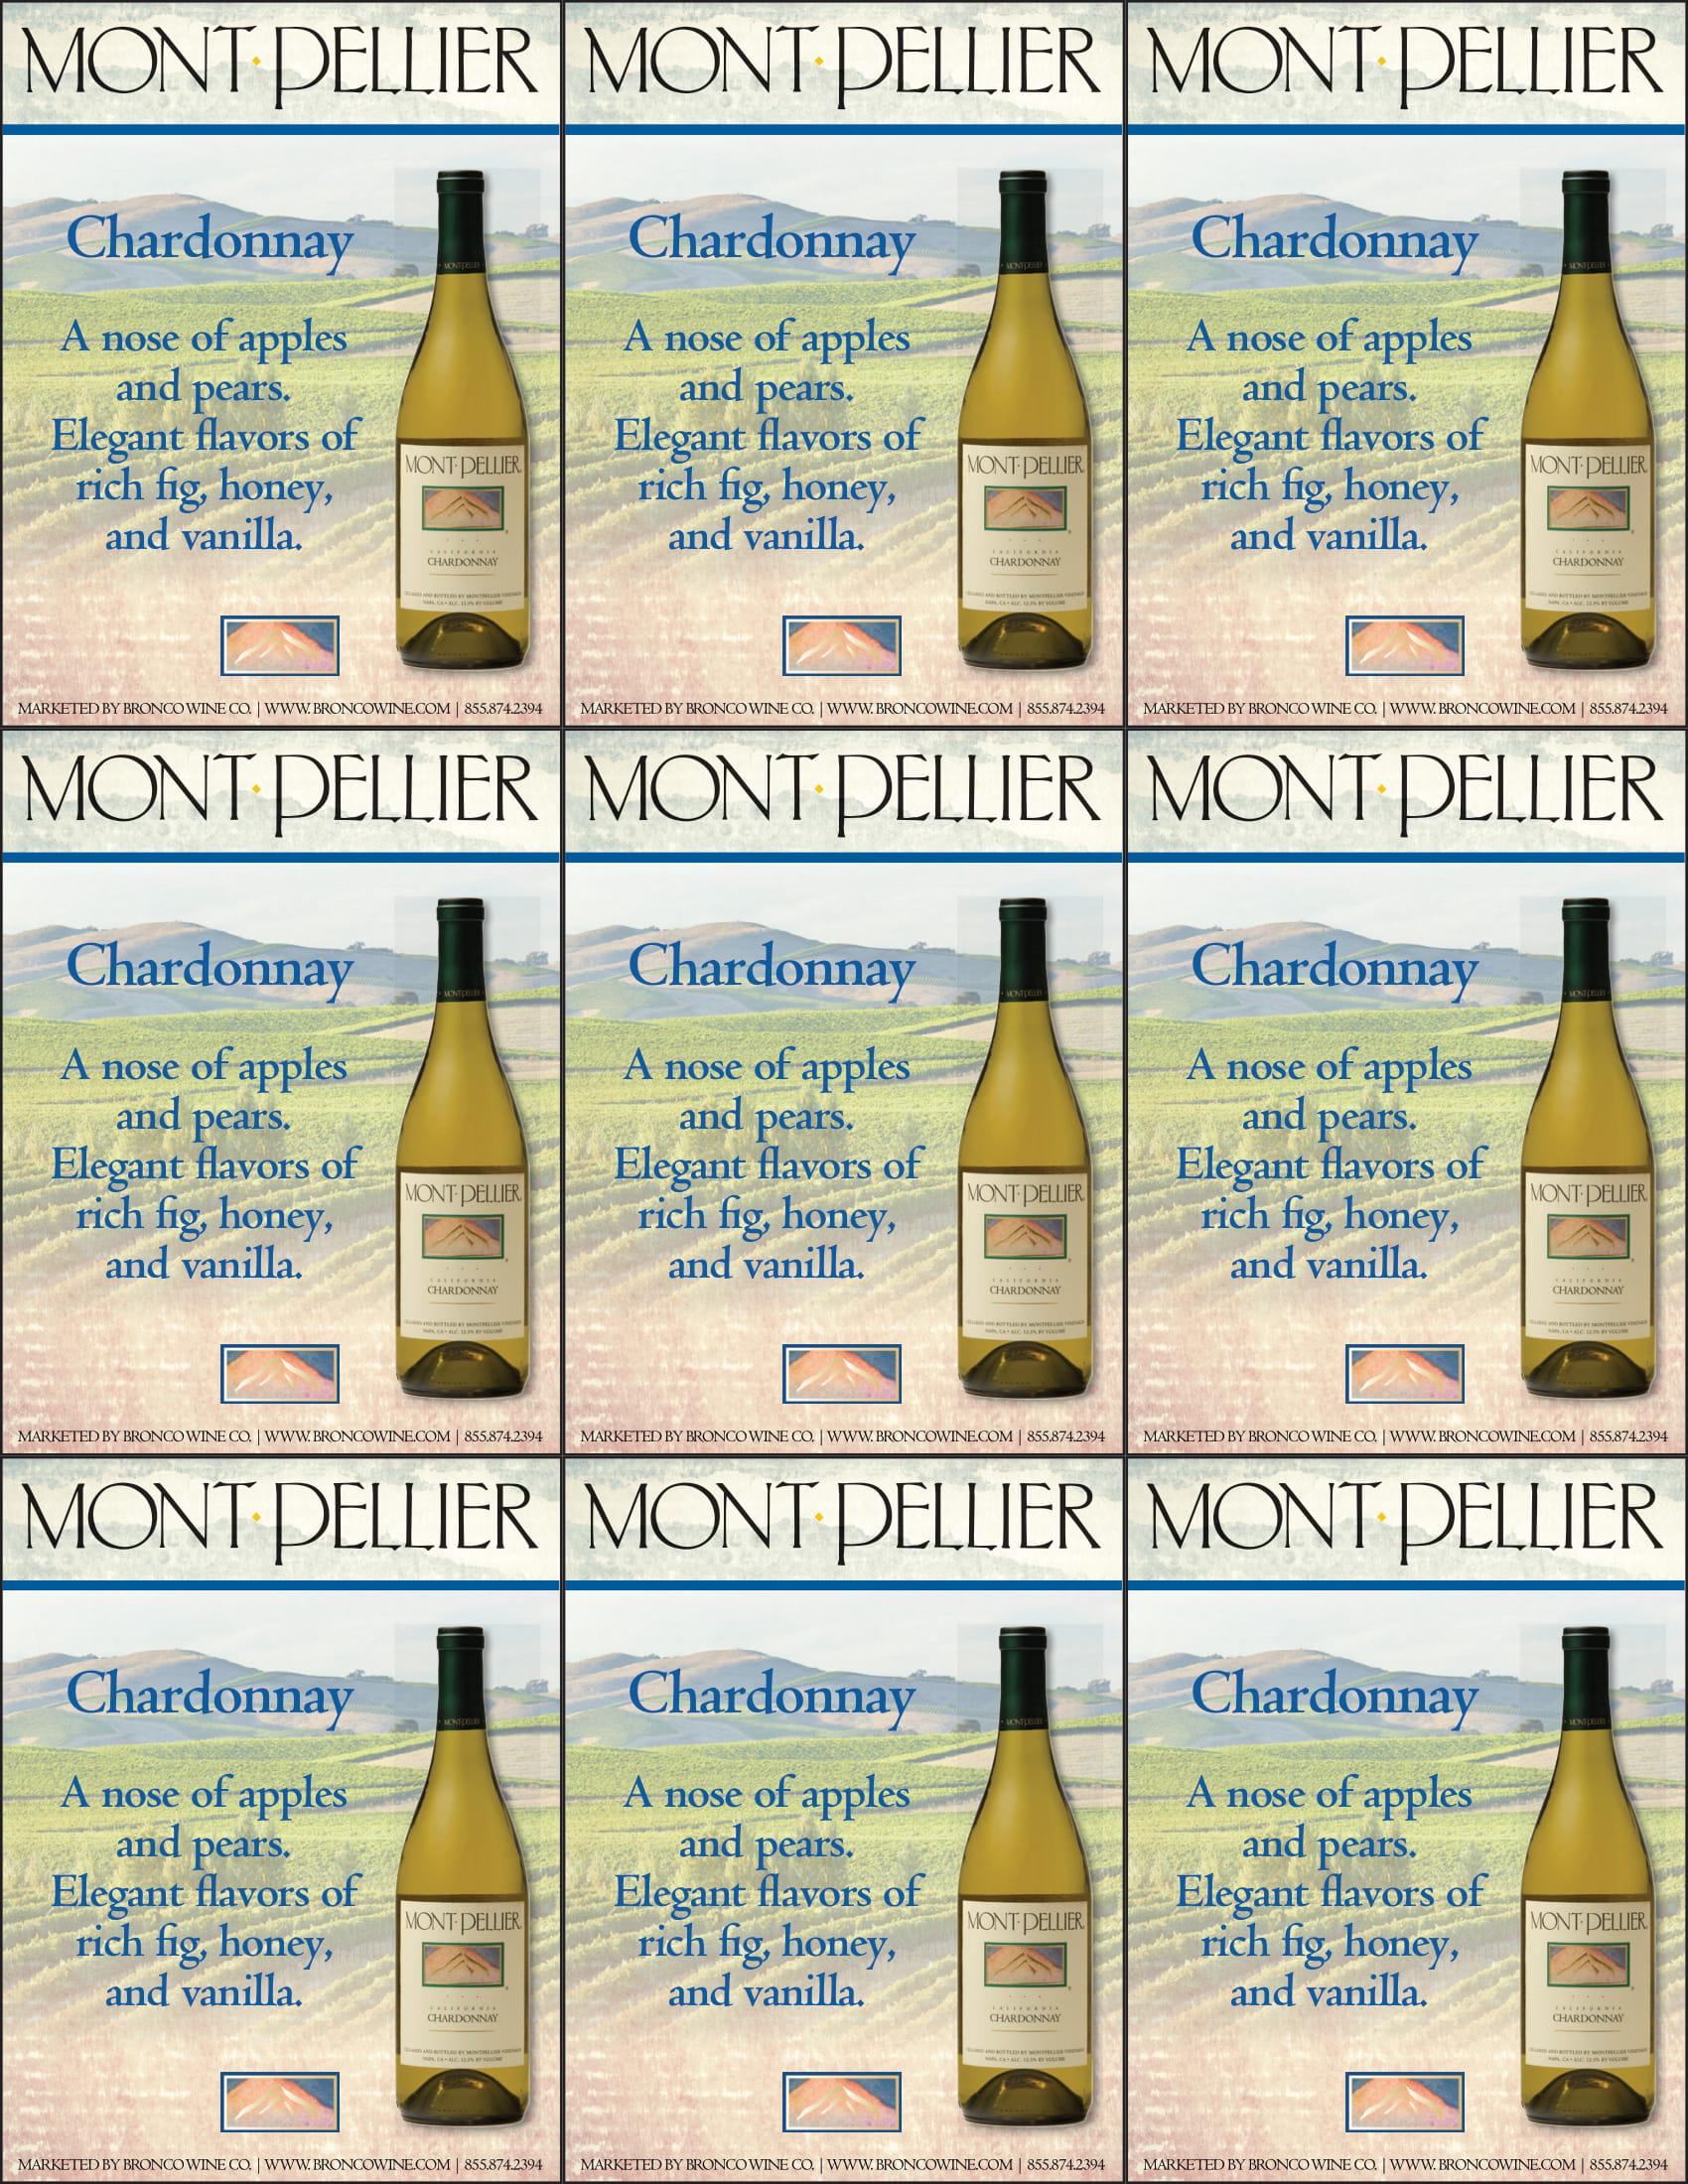 Montpellier Chardonnay Shelf Talker